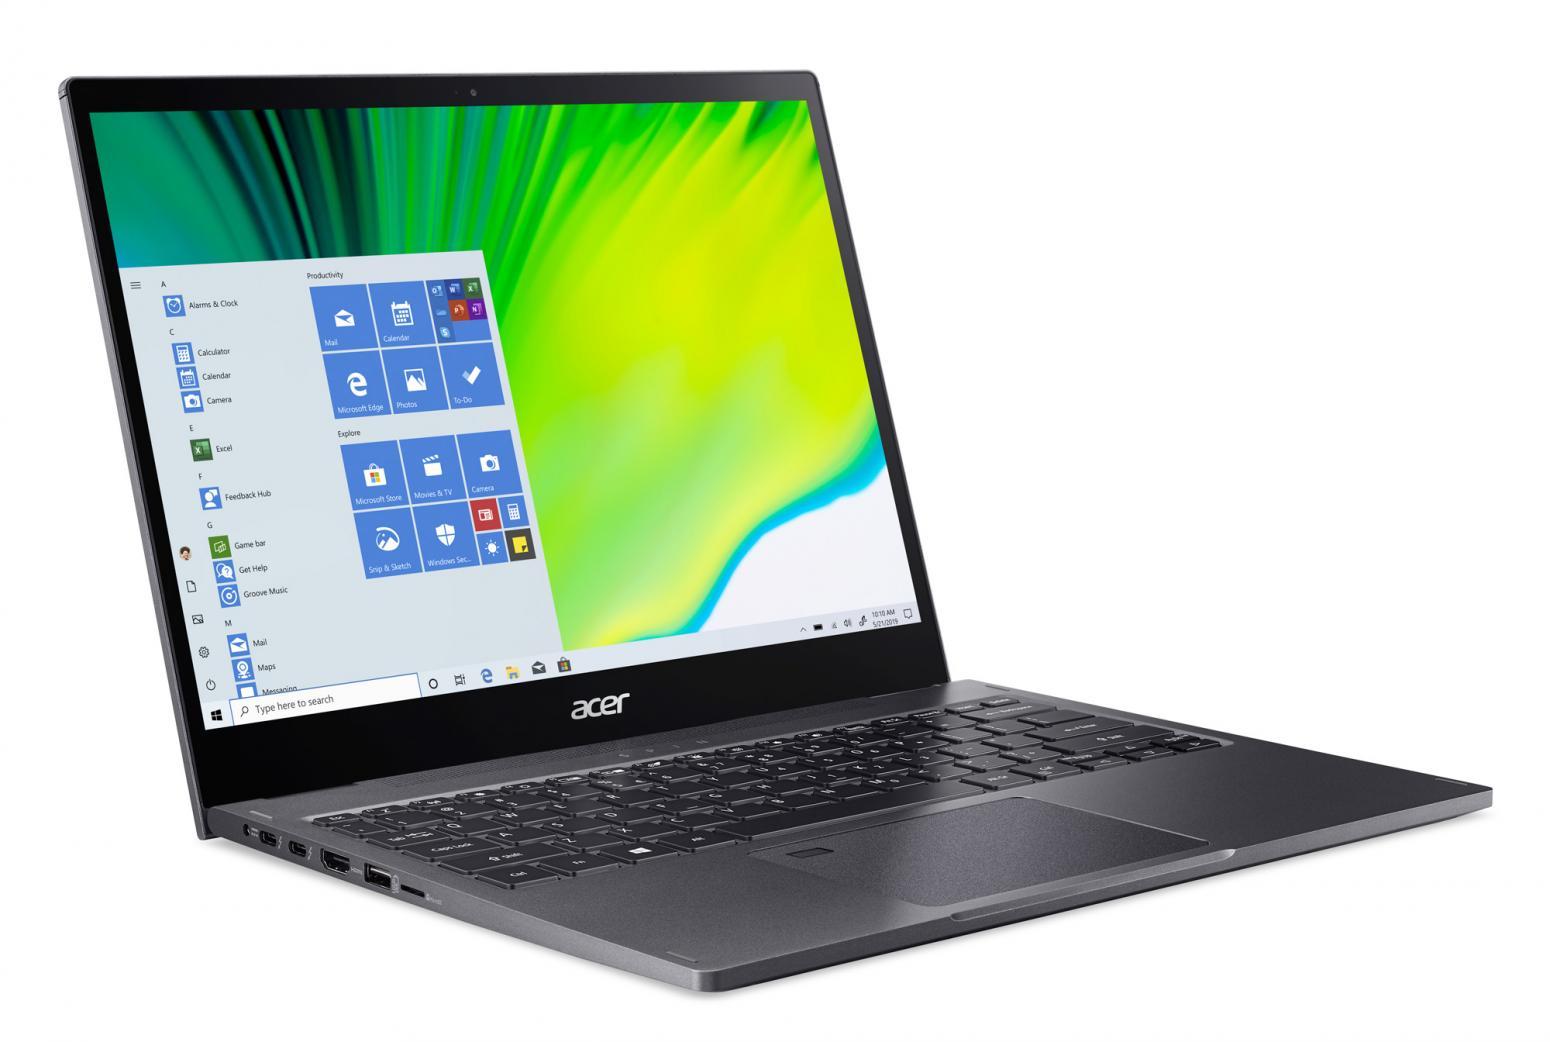 Ordinateur portable Acer Spin 5 SP513-54N-59ED Gris - QHD Tactile, Stylet - photo 3